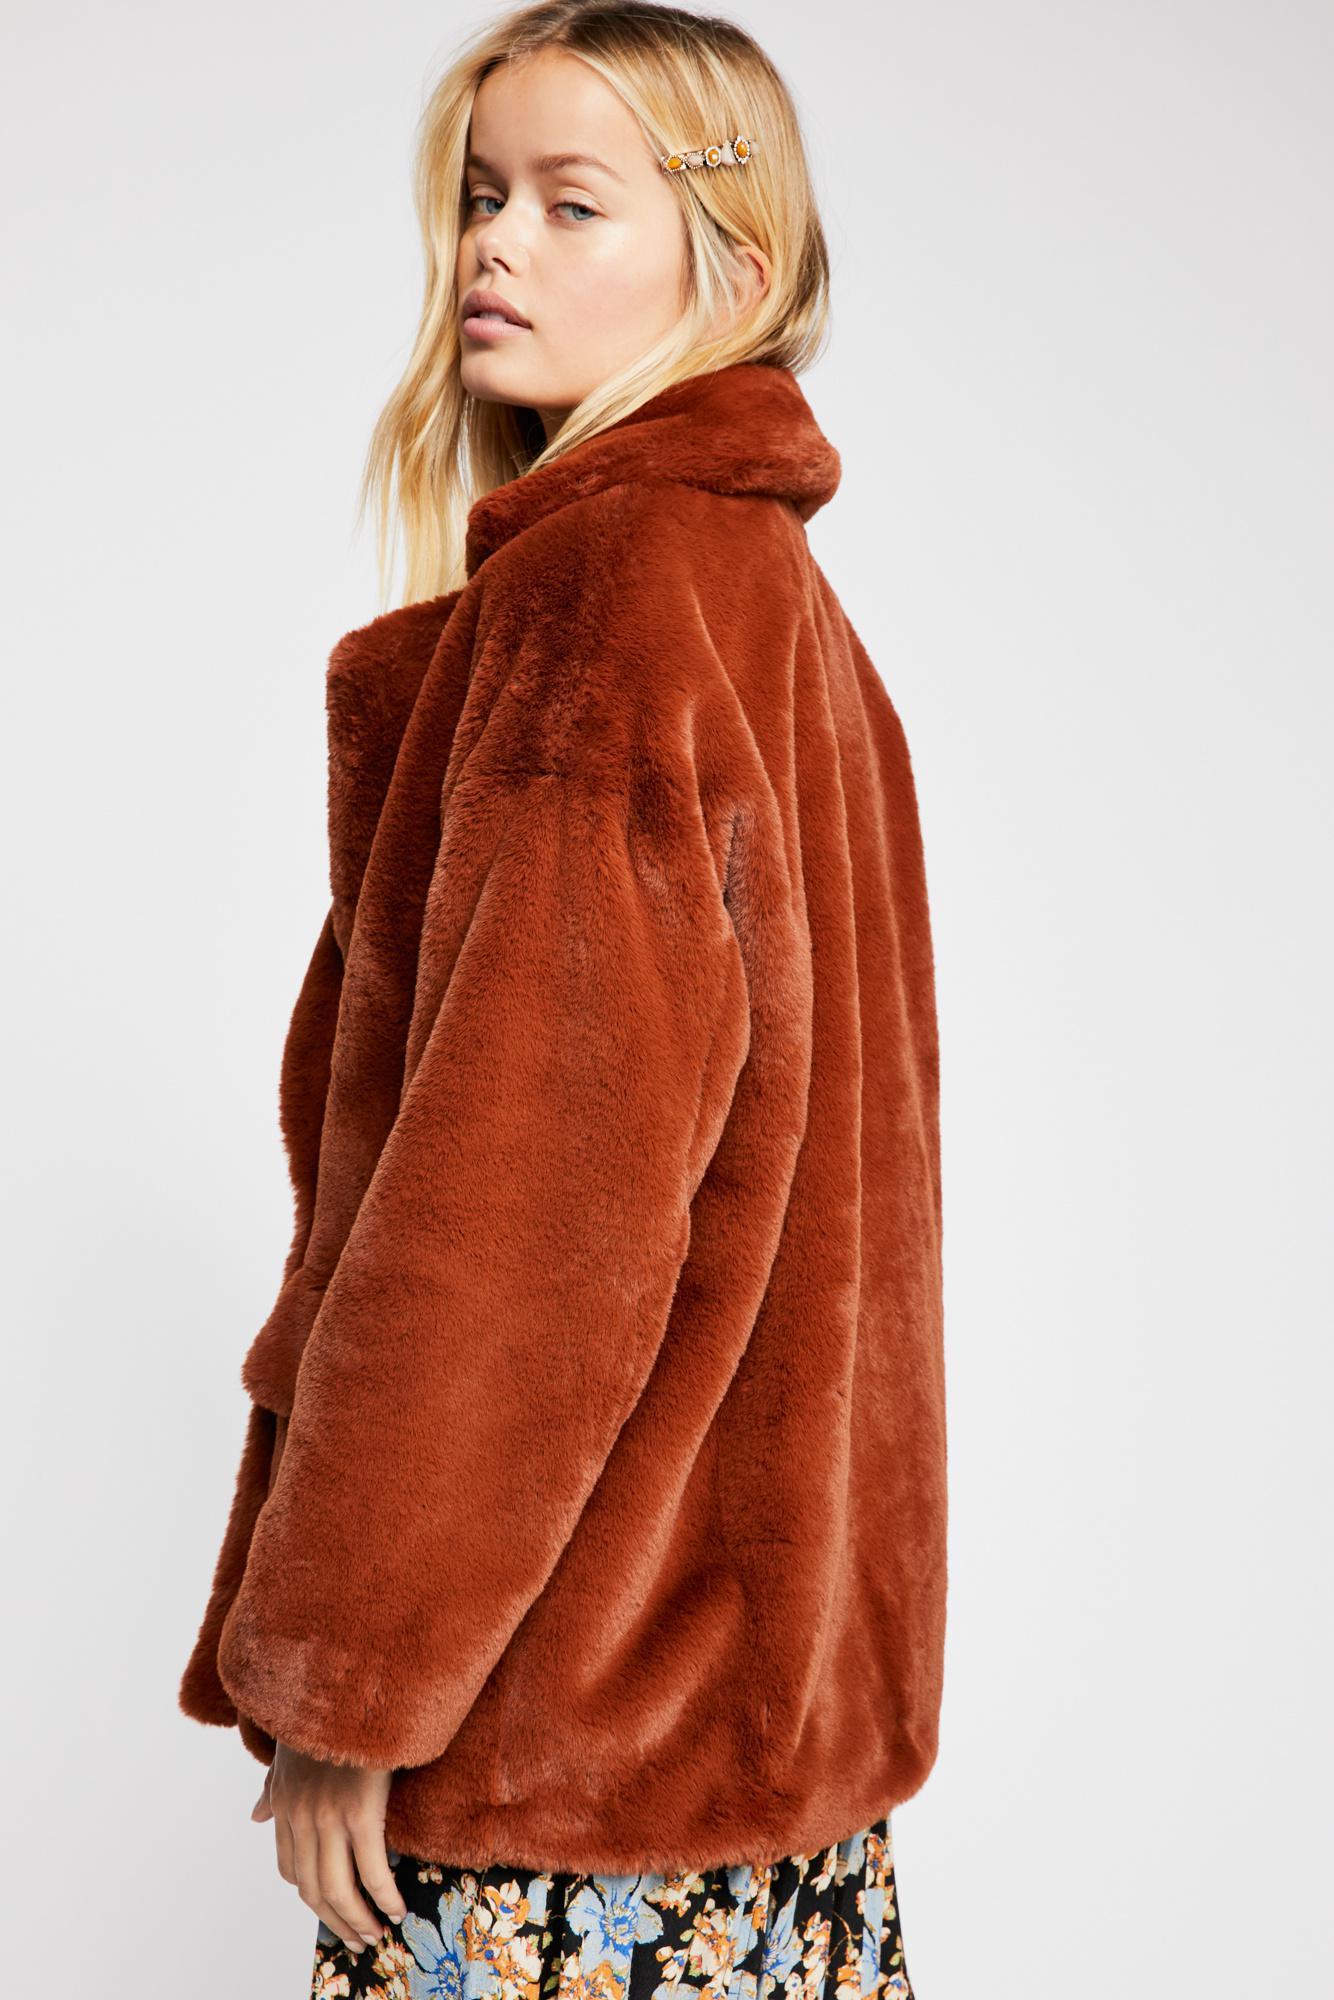 e837c437d9b0 Free People - Brown Solid Kate Faux Fur Coat - Lyst. View fullscreen